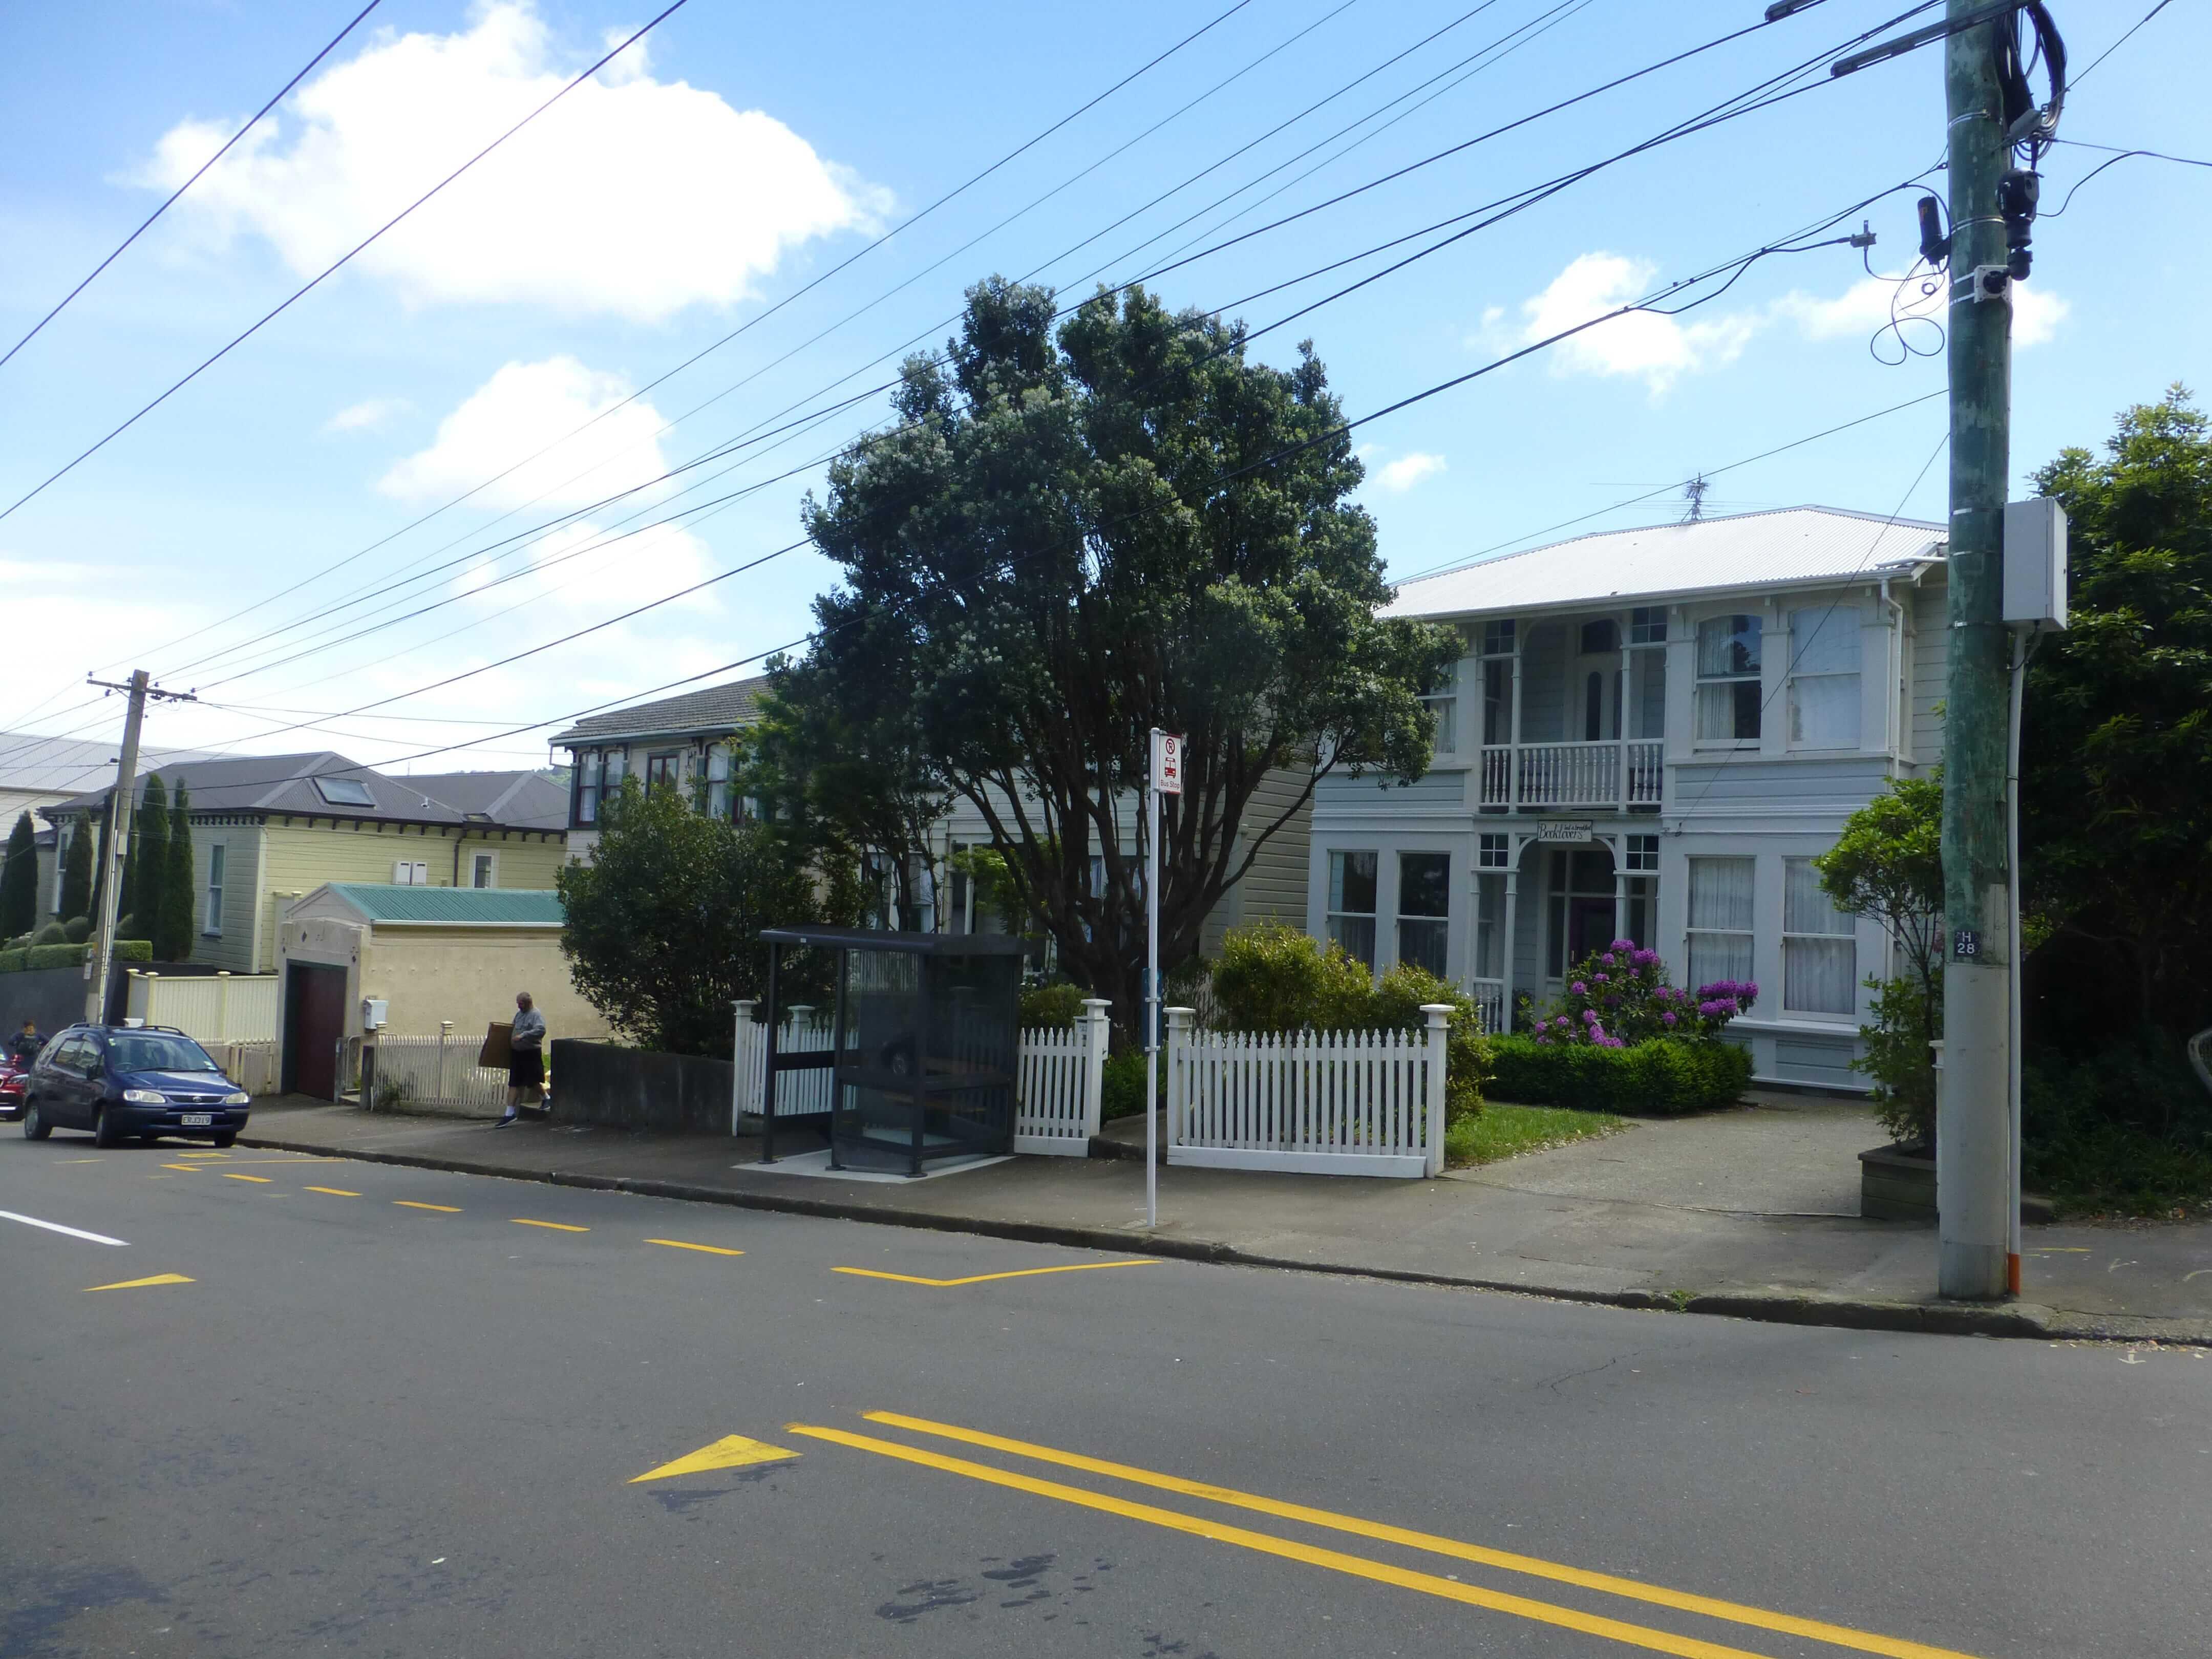 in Wellington, Neuseeland, Weit-weg.reisen 19